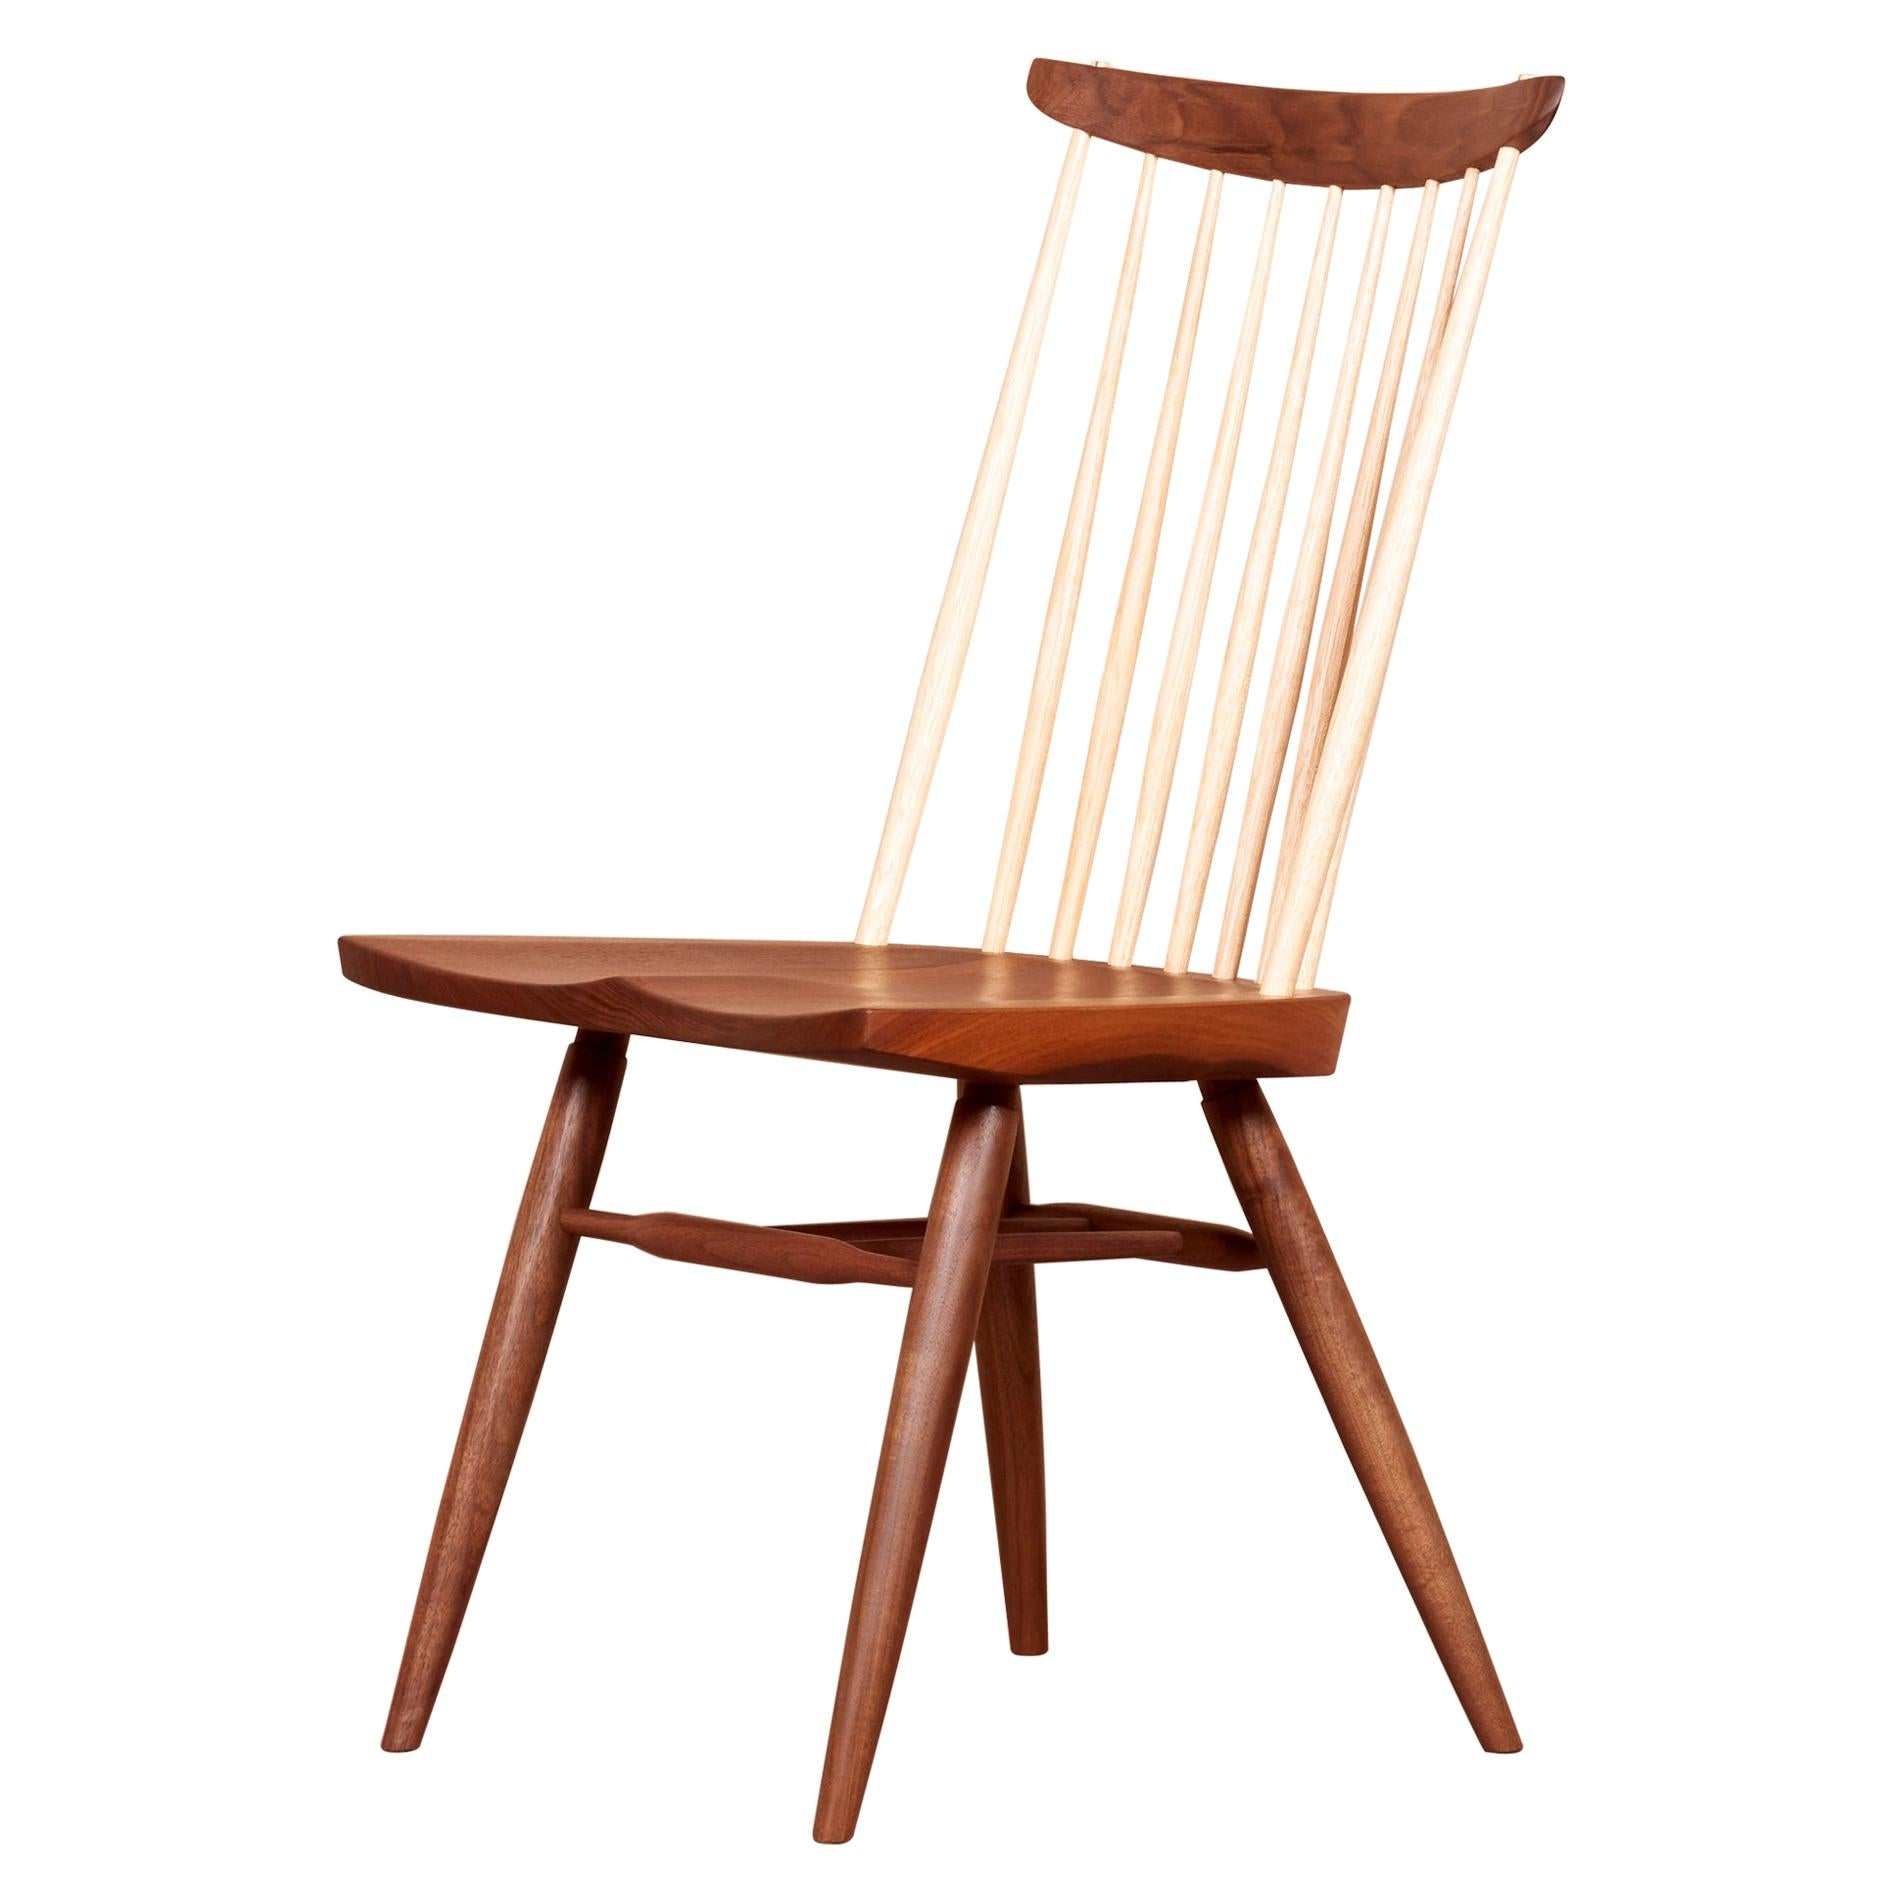 George Nakashima Studio, New Chair, US 2021